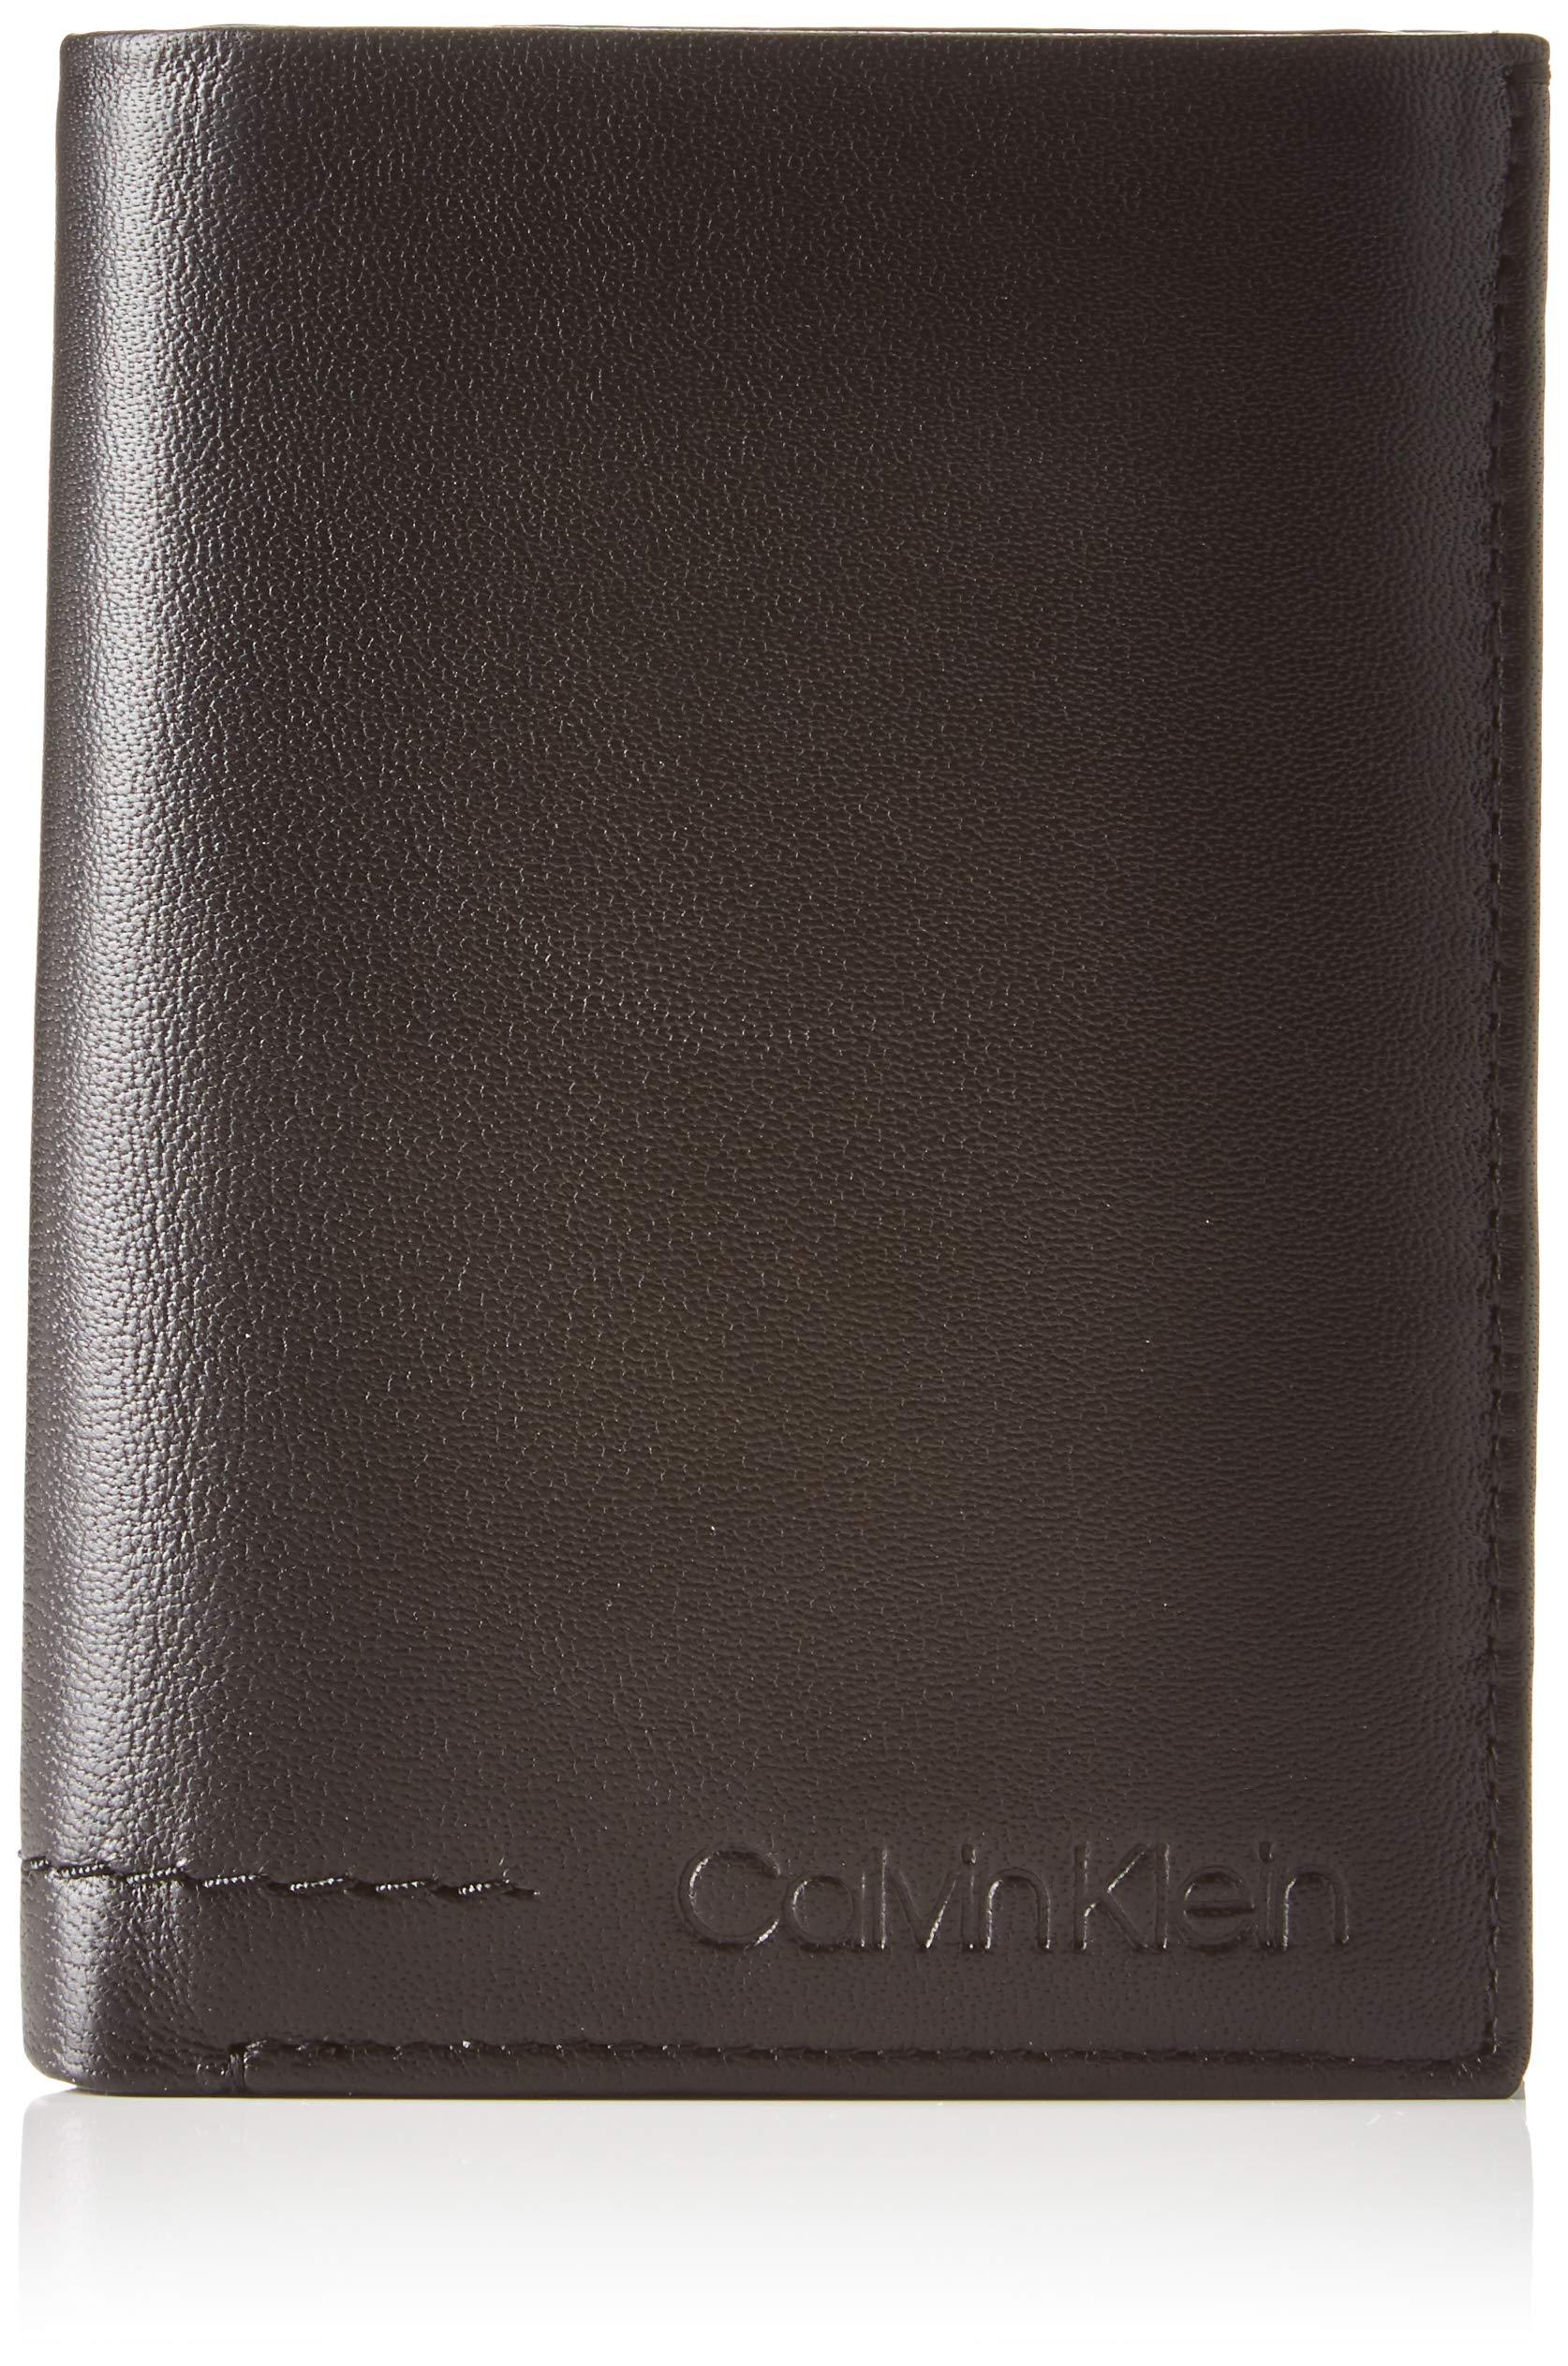 Calvin Klein FLEX NS 8CC COIN PASSHombreShoppers y bolsos de hombroNegro (Black) 9×2.7×12.5 centimeters (B x H x T)